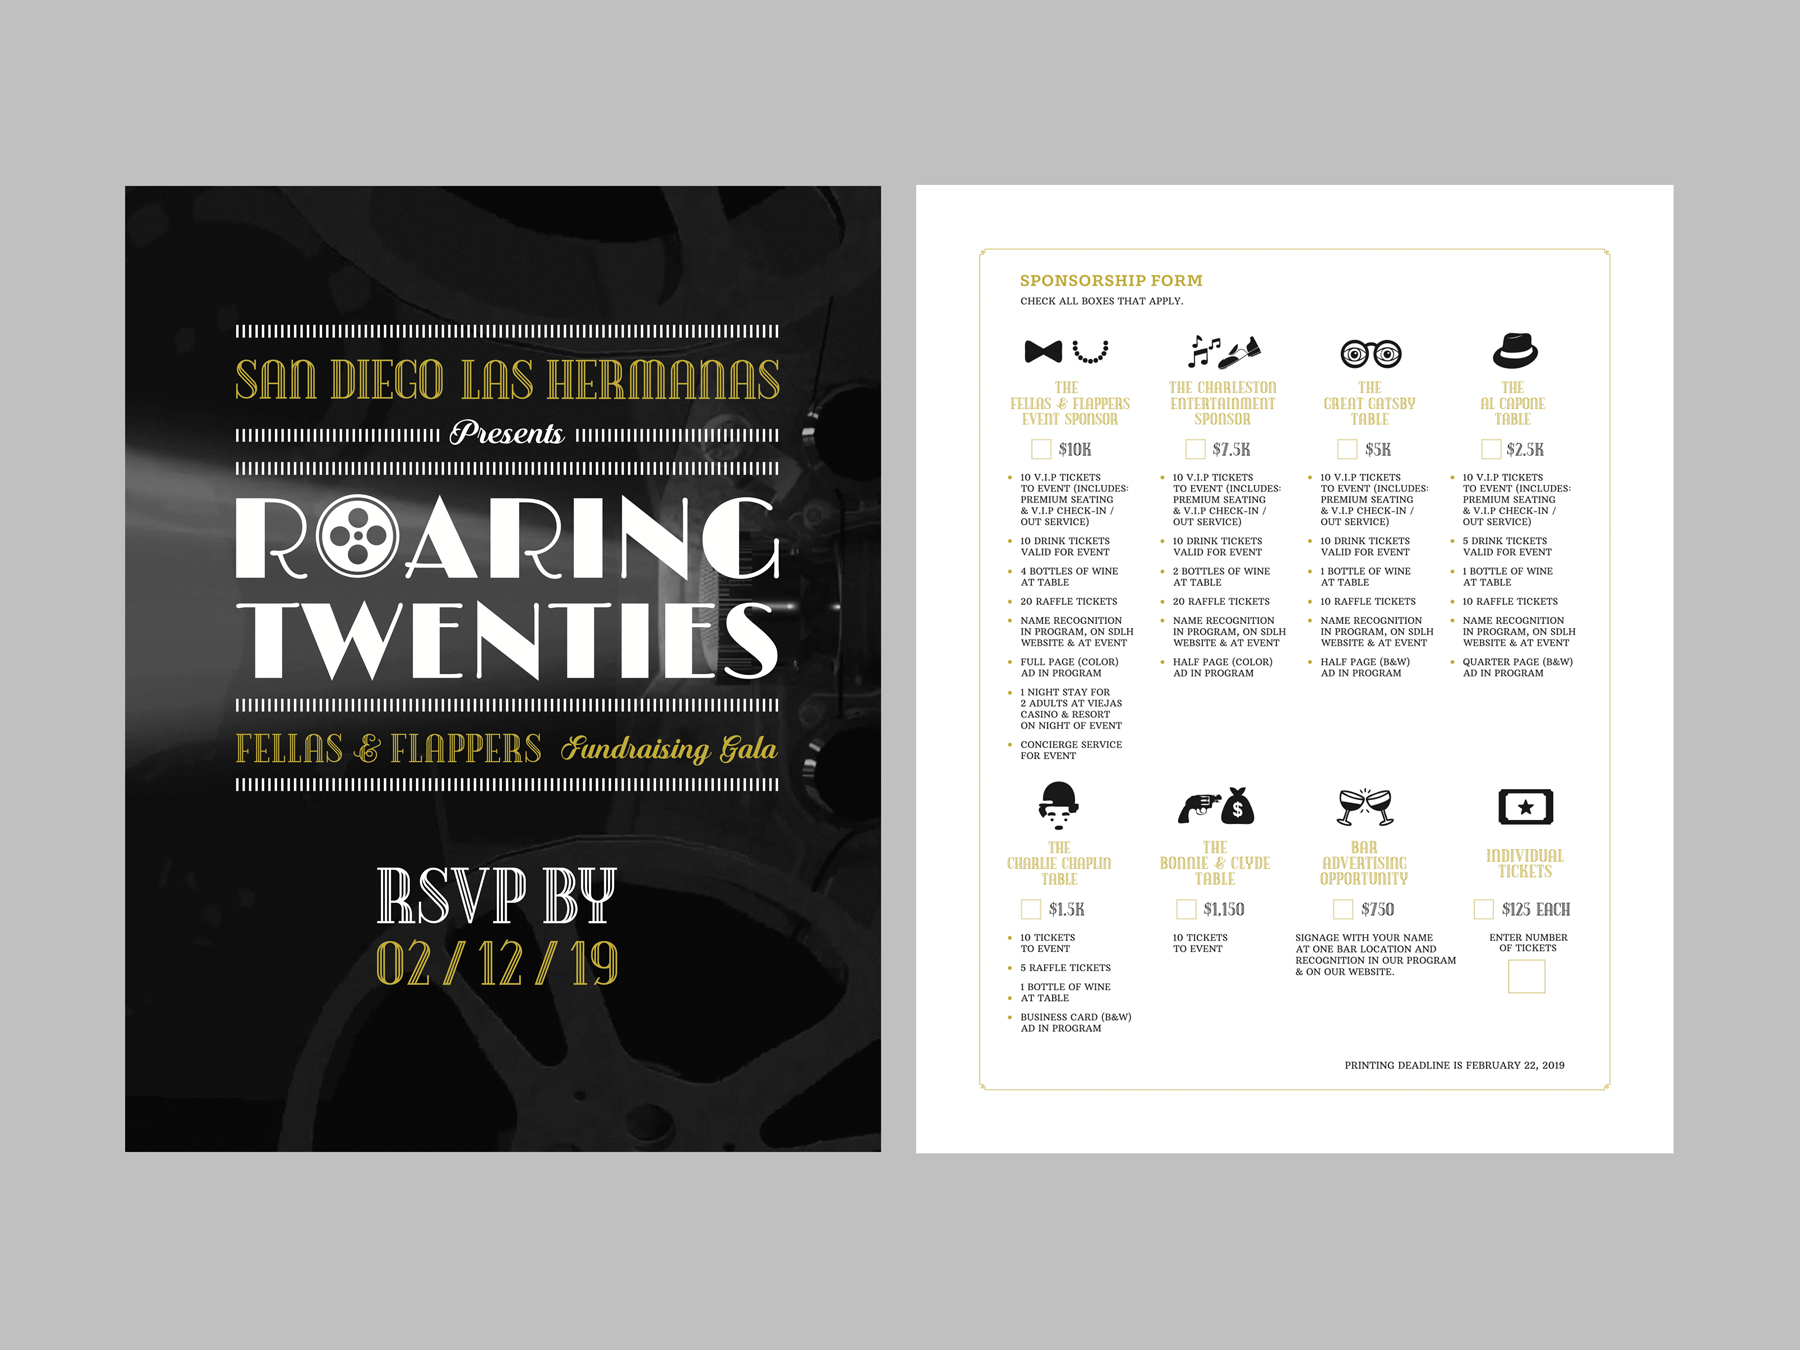 Roaring Twenties RSVP Double-Sided Cards